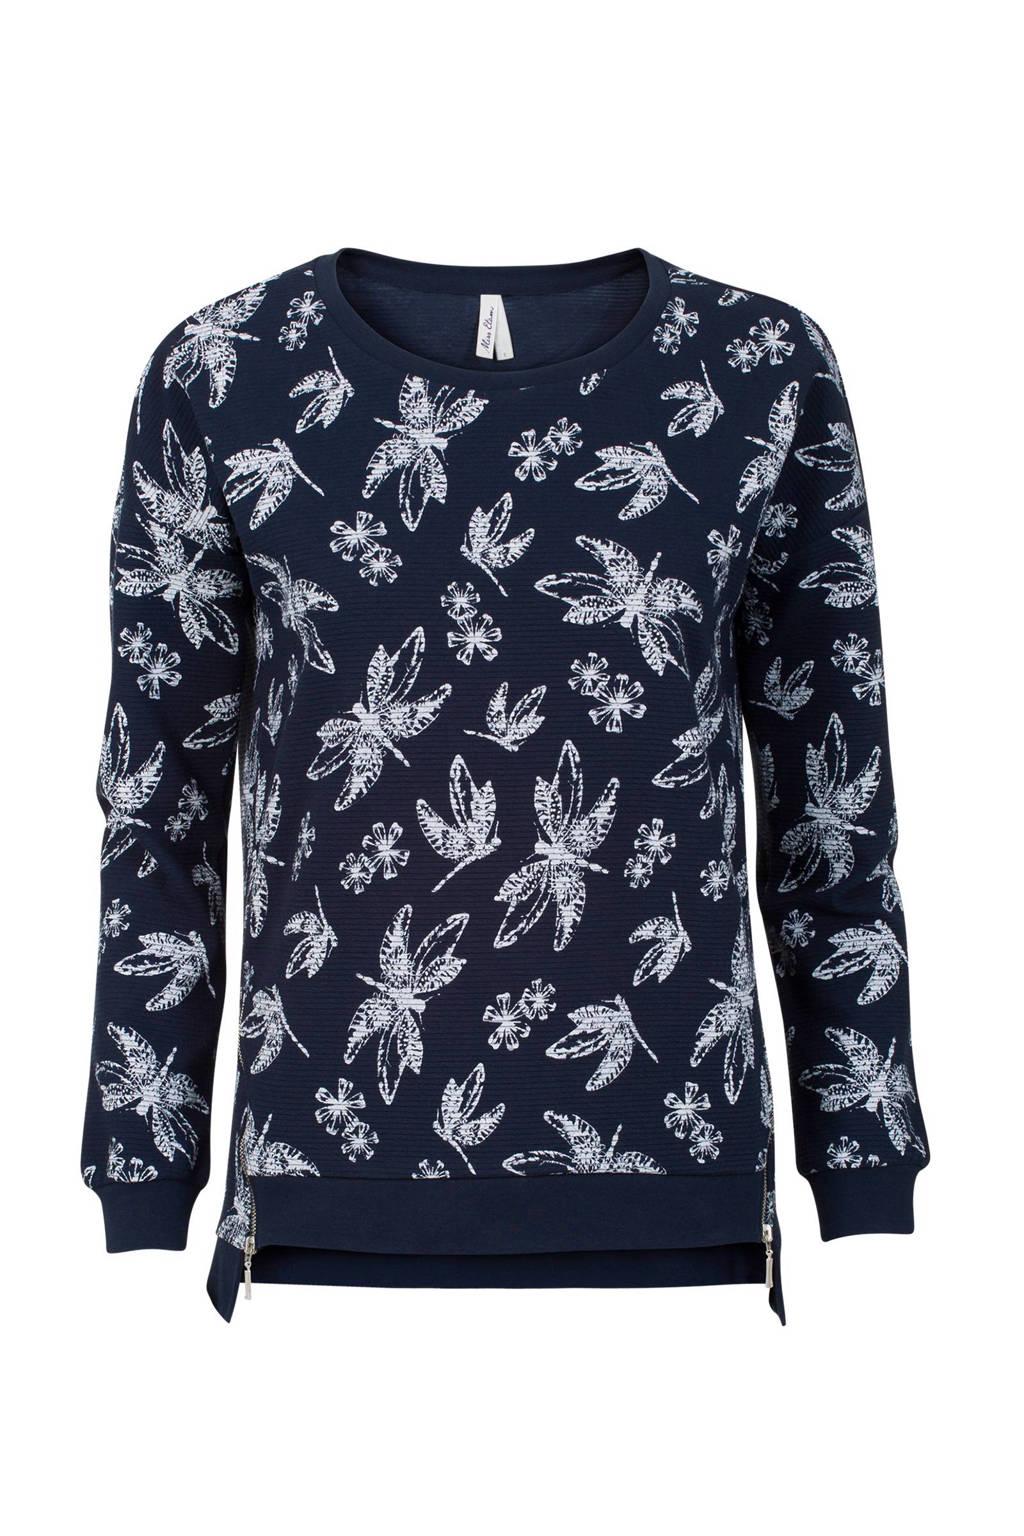 Miss Etam Regulier sweater, Donkerblauw